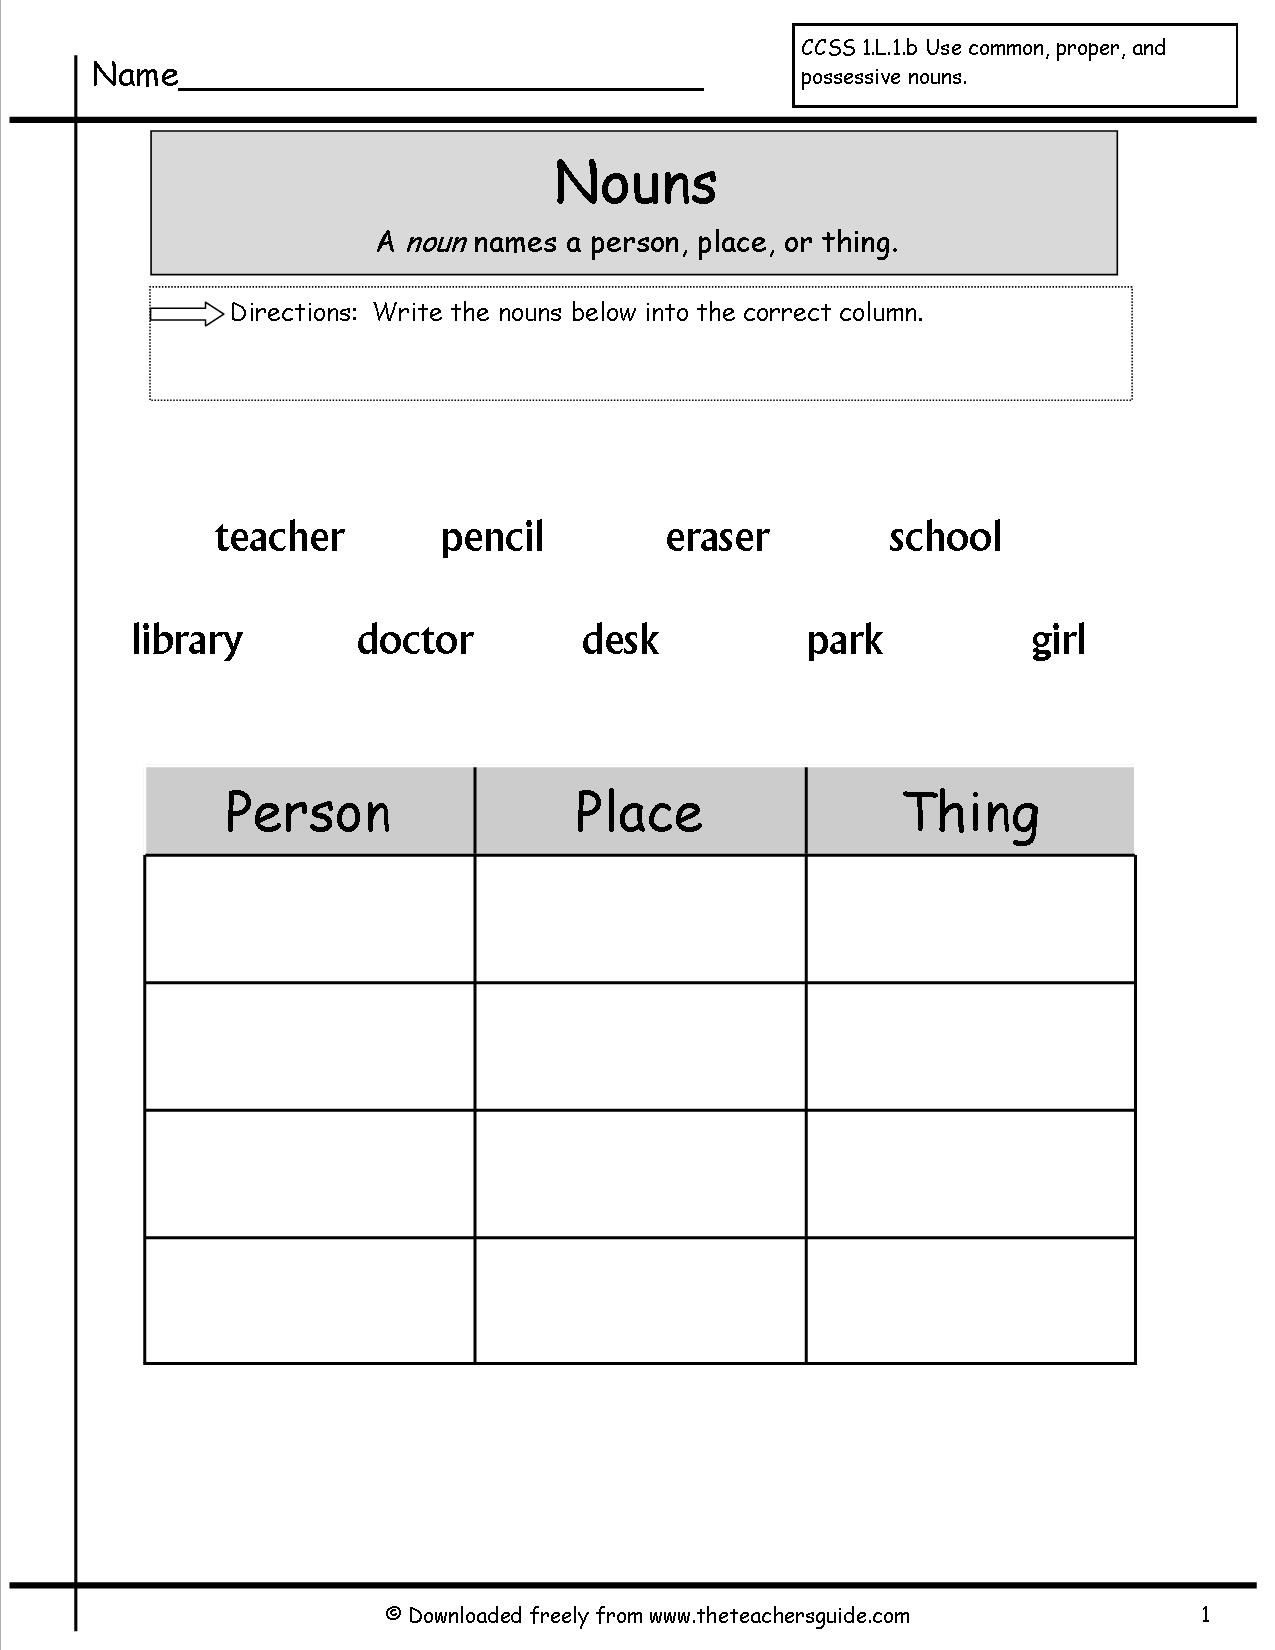 Grammer Printables | Nouns Worksheets Nouns Worksheets Identifying - Free Noun Printables